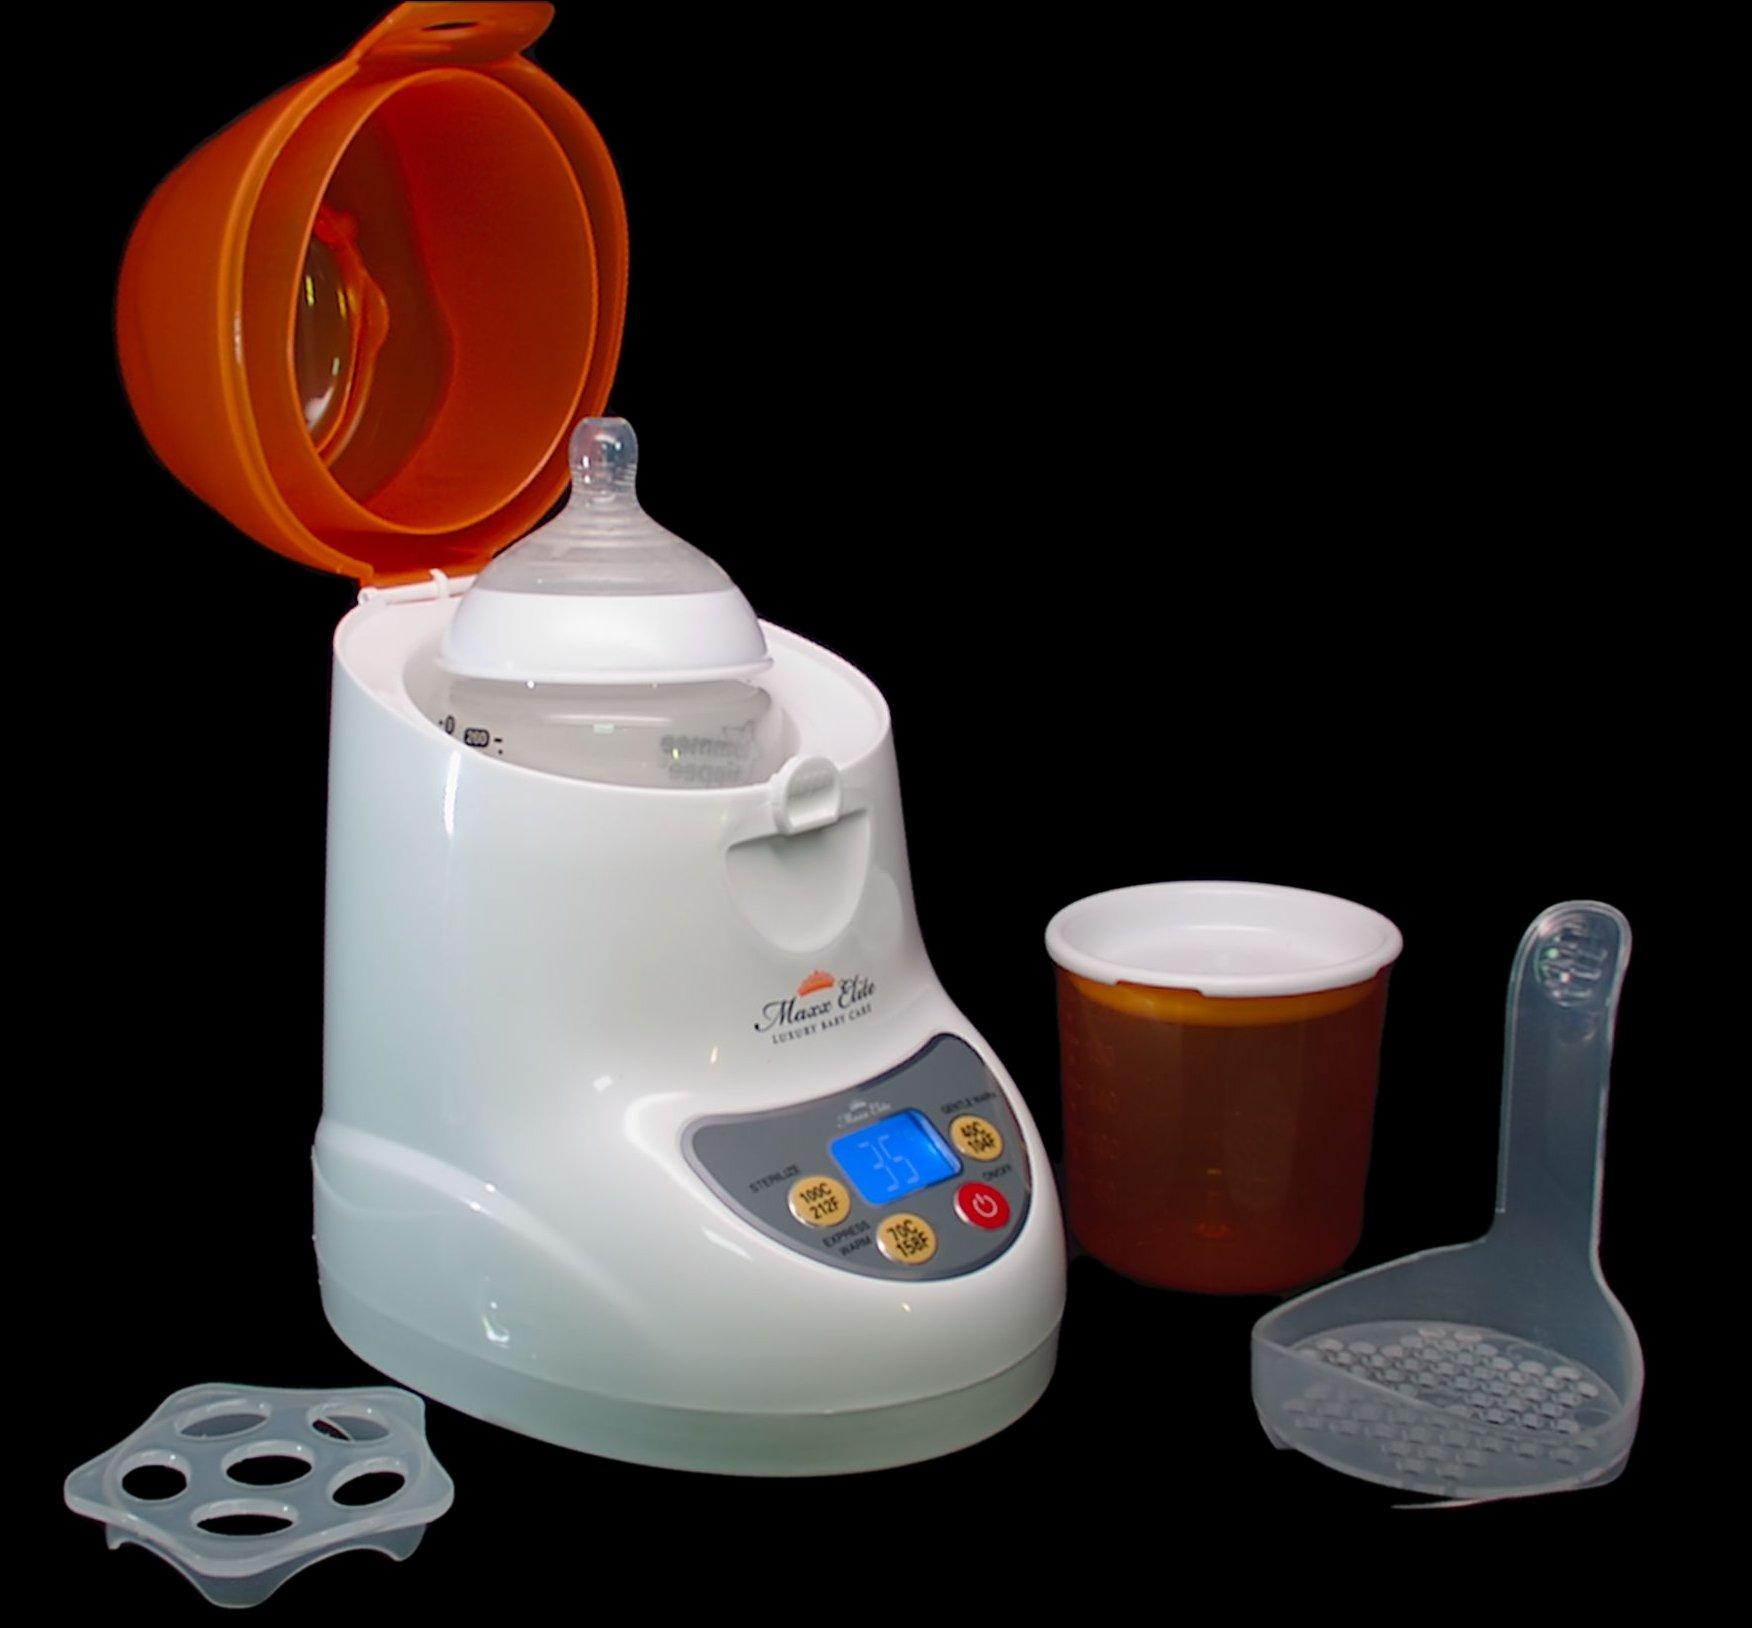 Maxx Elite ''Digital Gentle Warm'' Bottle Warmer & Sterilizer w/''Steady Warm'' and LCD Display (Orange) by Maxx Elite (Image #5)